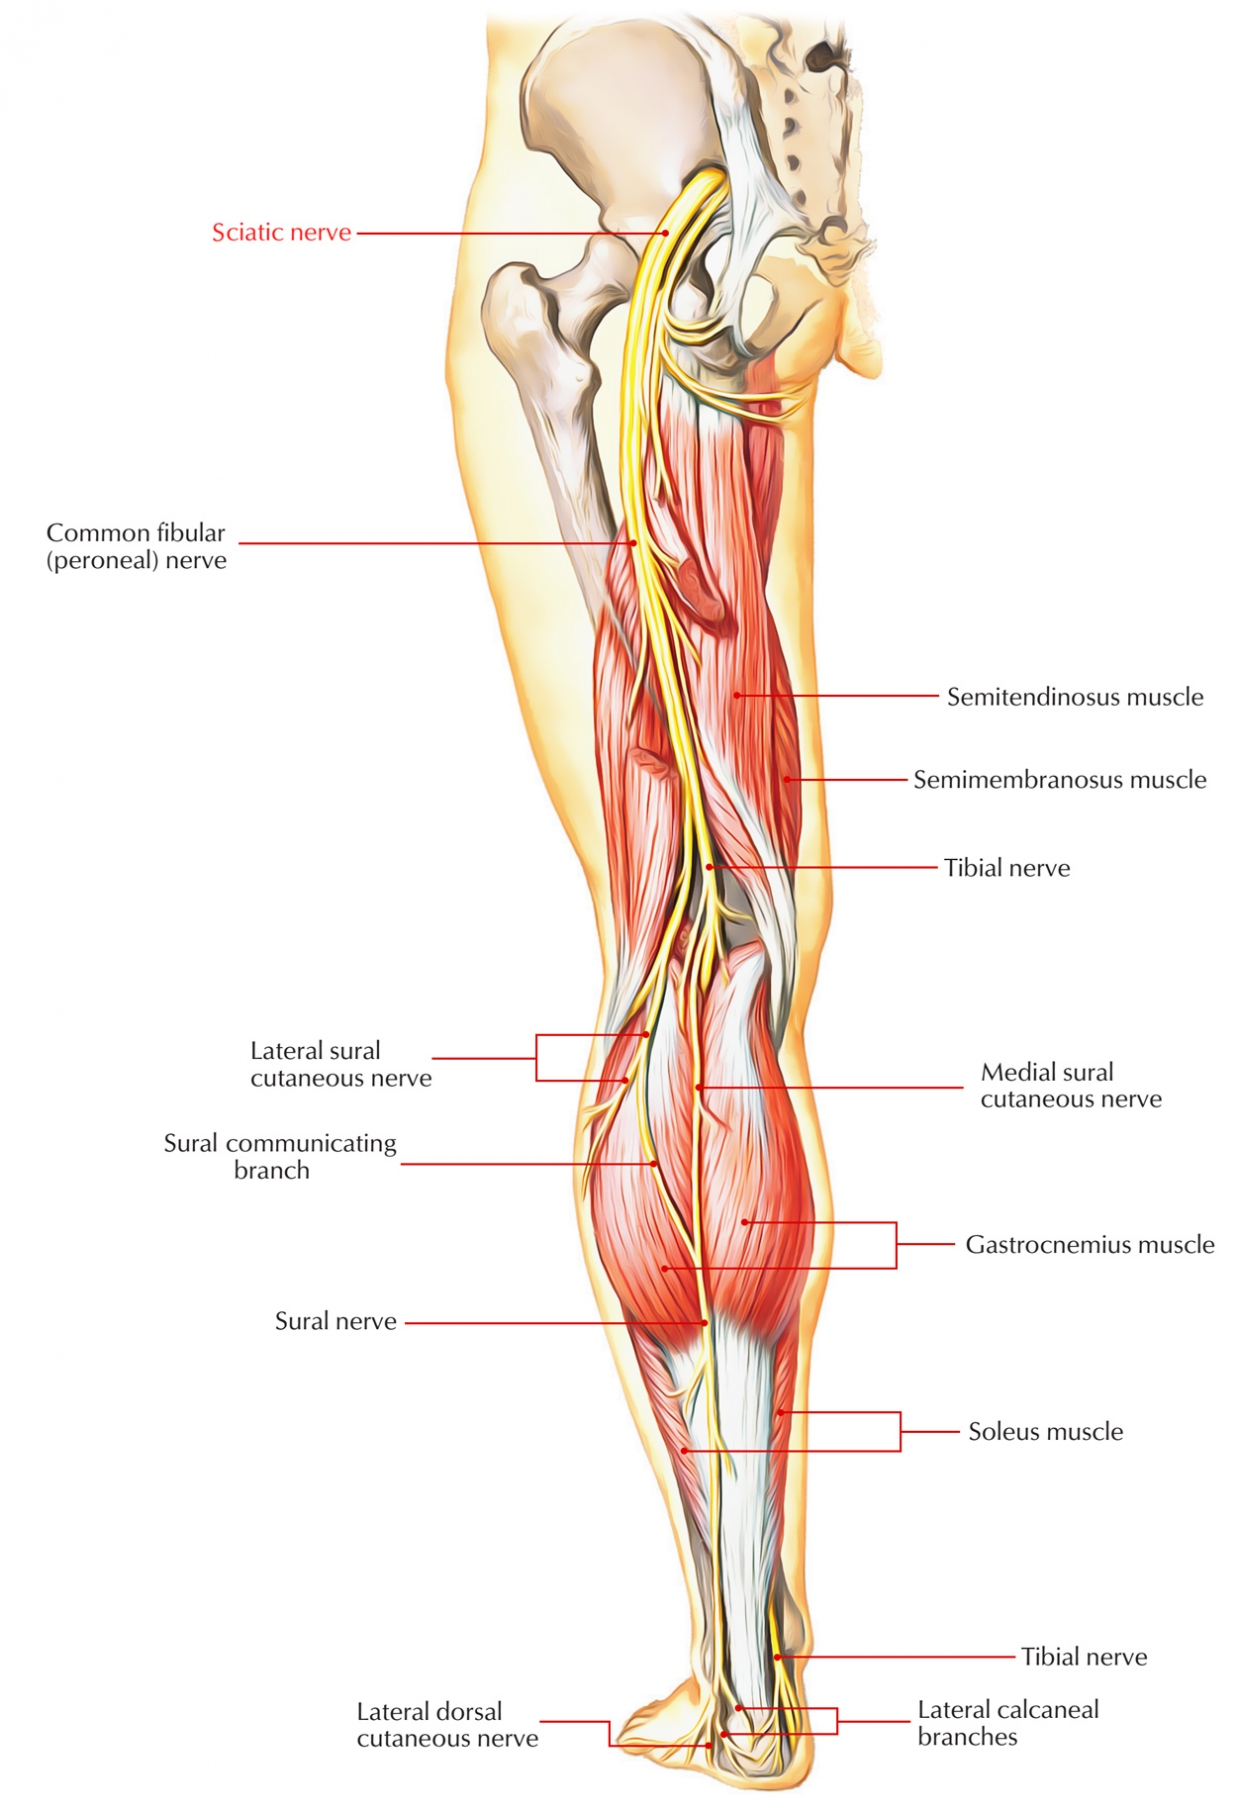 sciatic nerve anatomy Kleoachfix - diagram of sciatic nerve